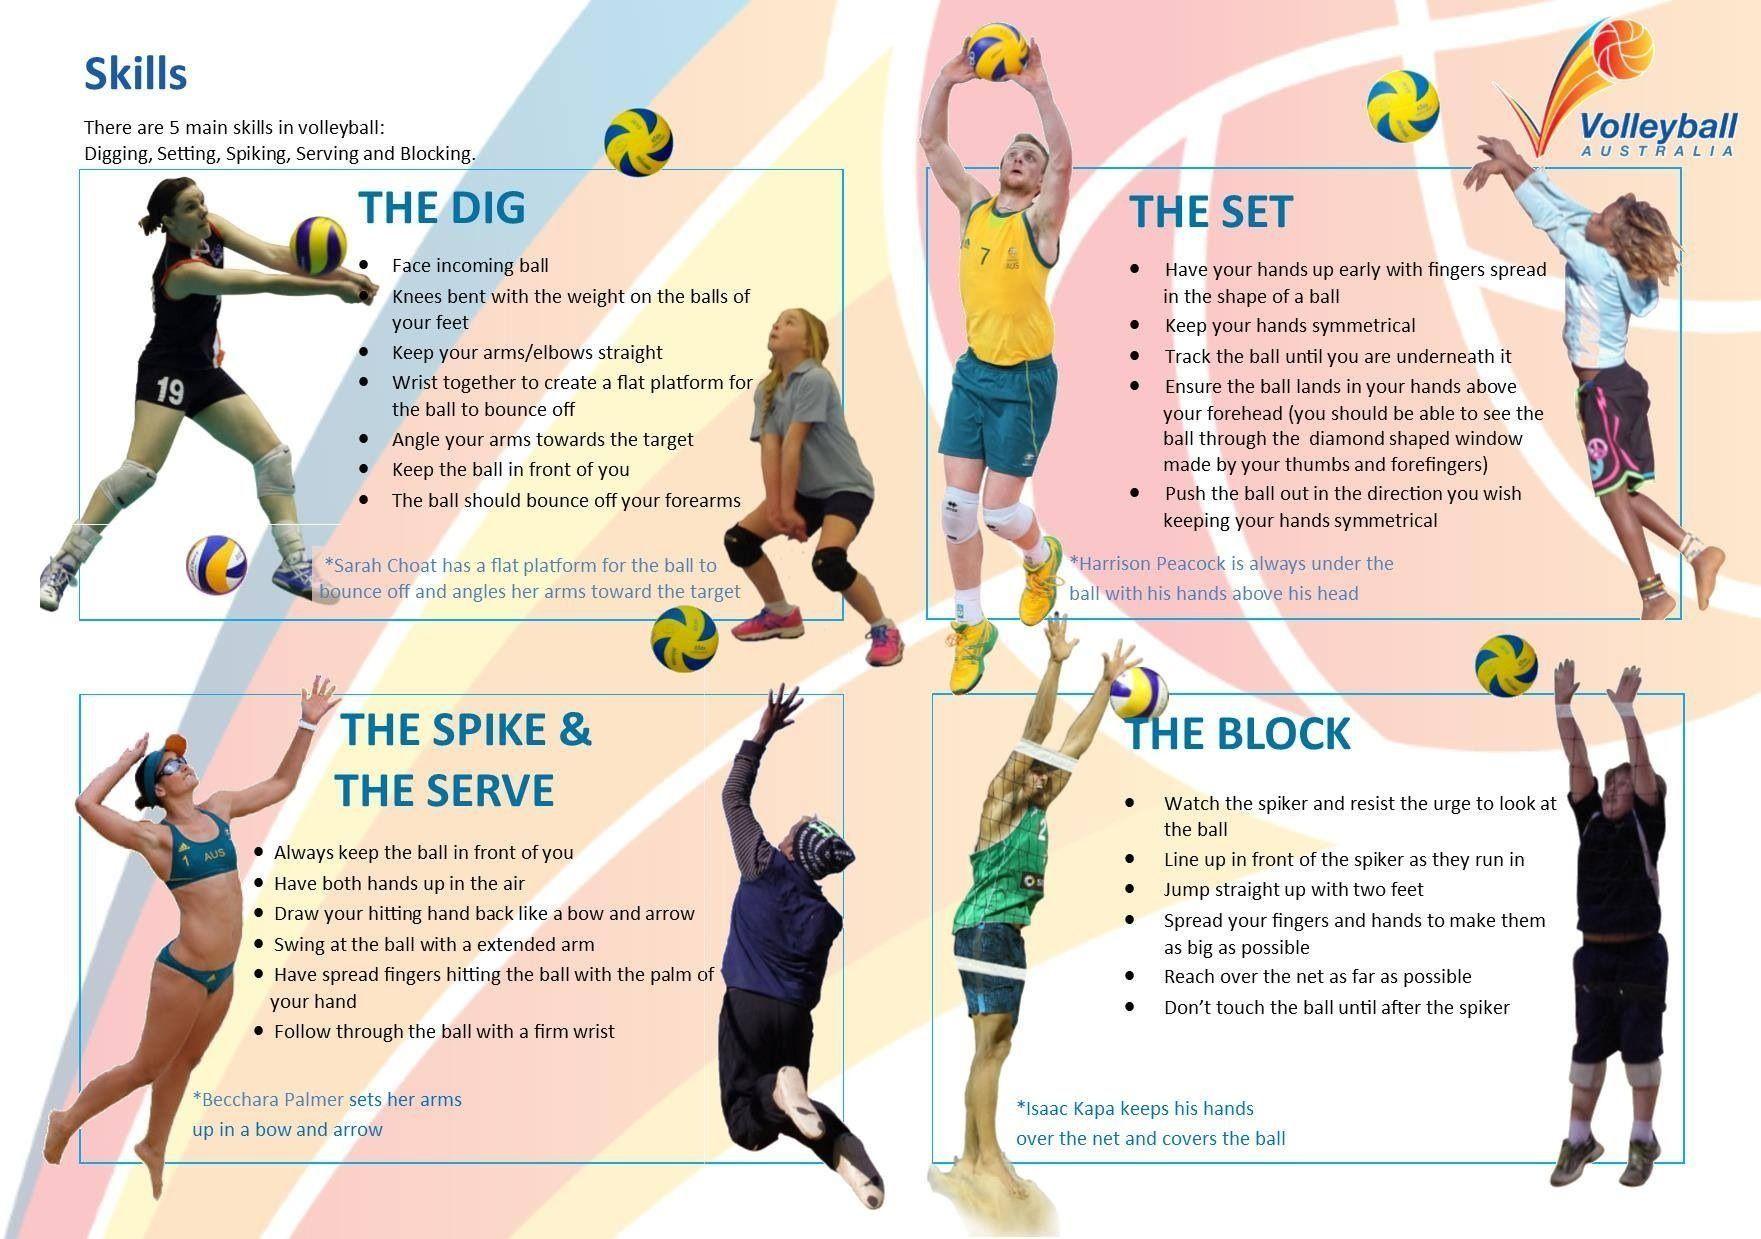 Best Volleyball Matches Volleyball Skills Volleyball Skills Model Provided By Volleyball Australia In 2020 Volleyball Skills Volleyball Workouts Coaching Volleyball